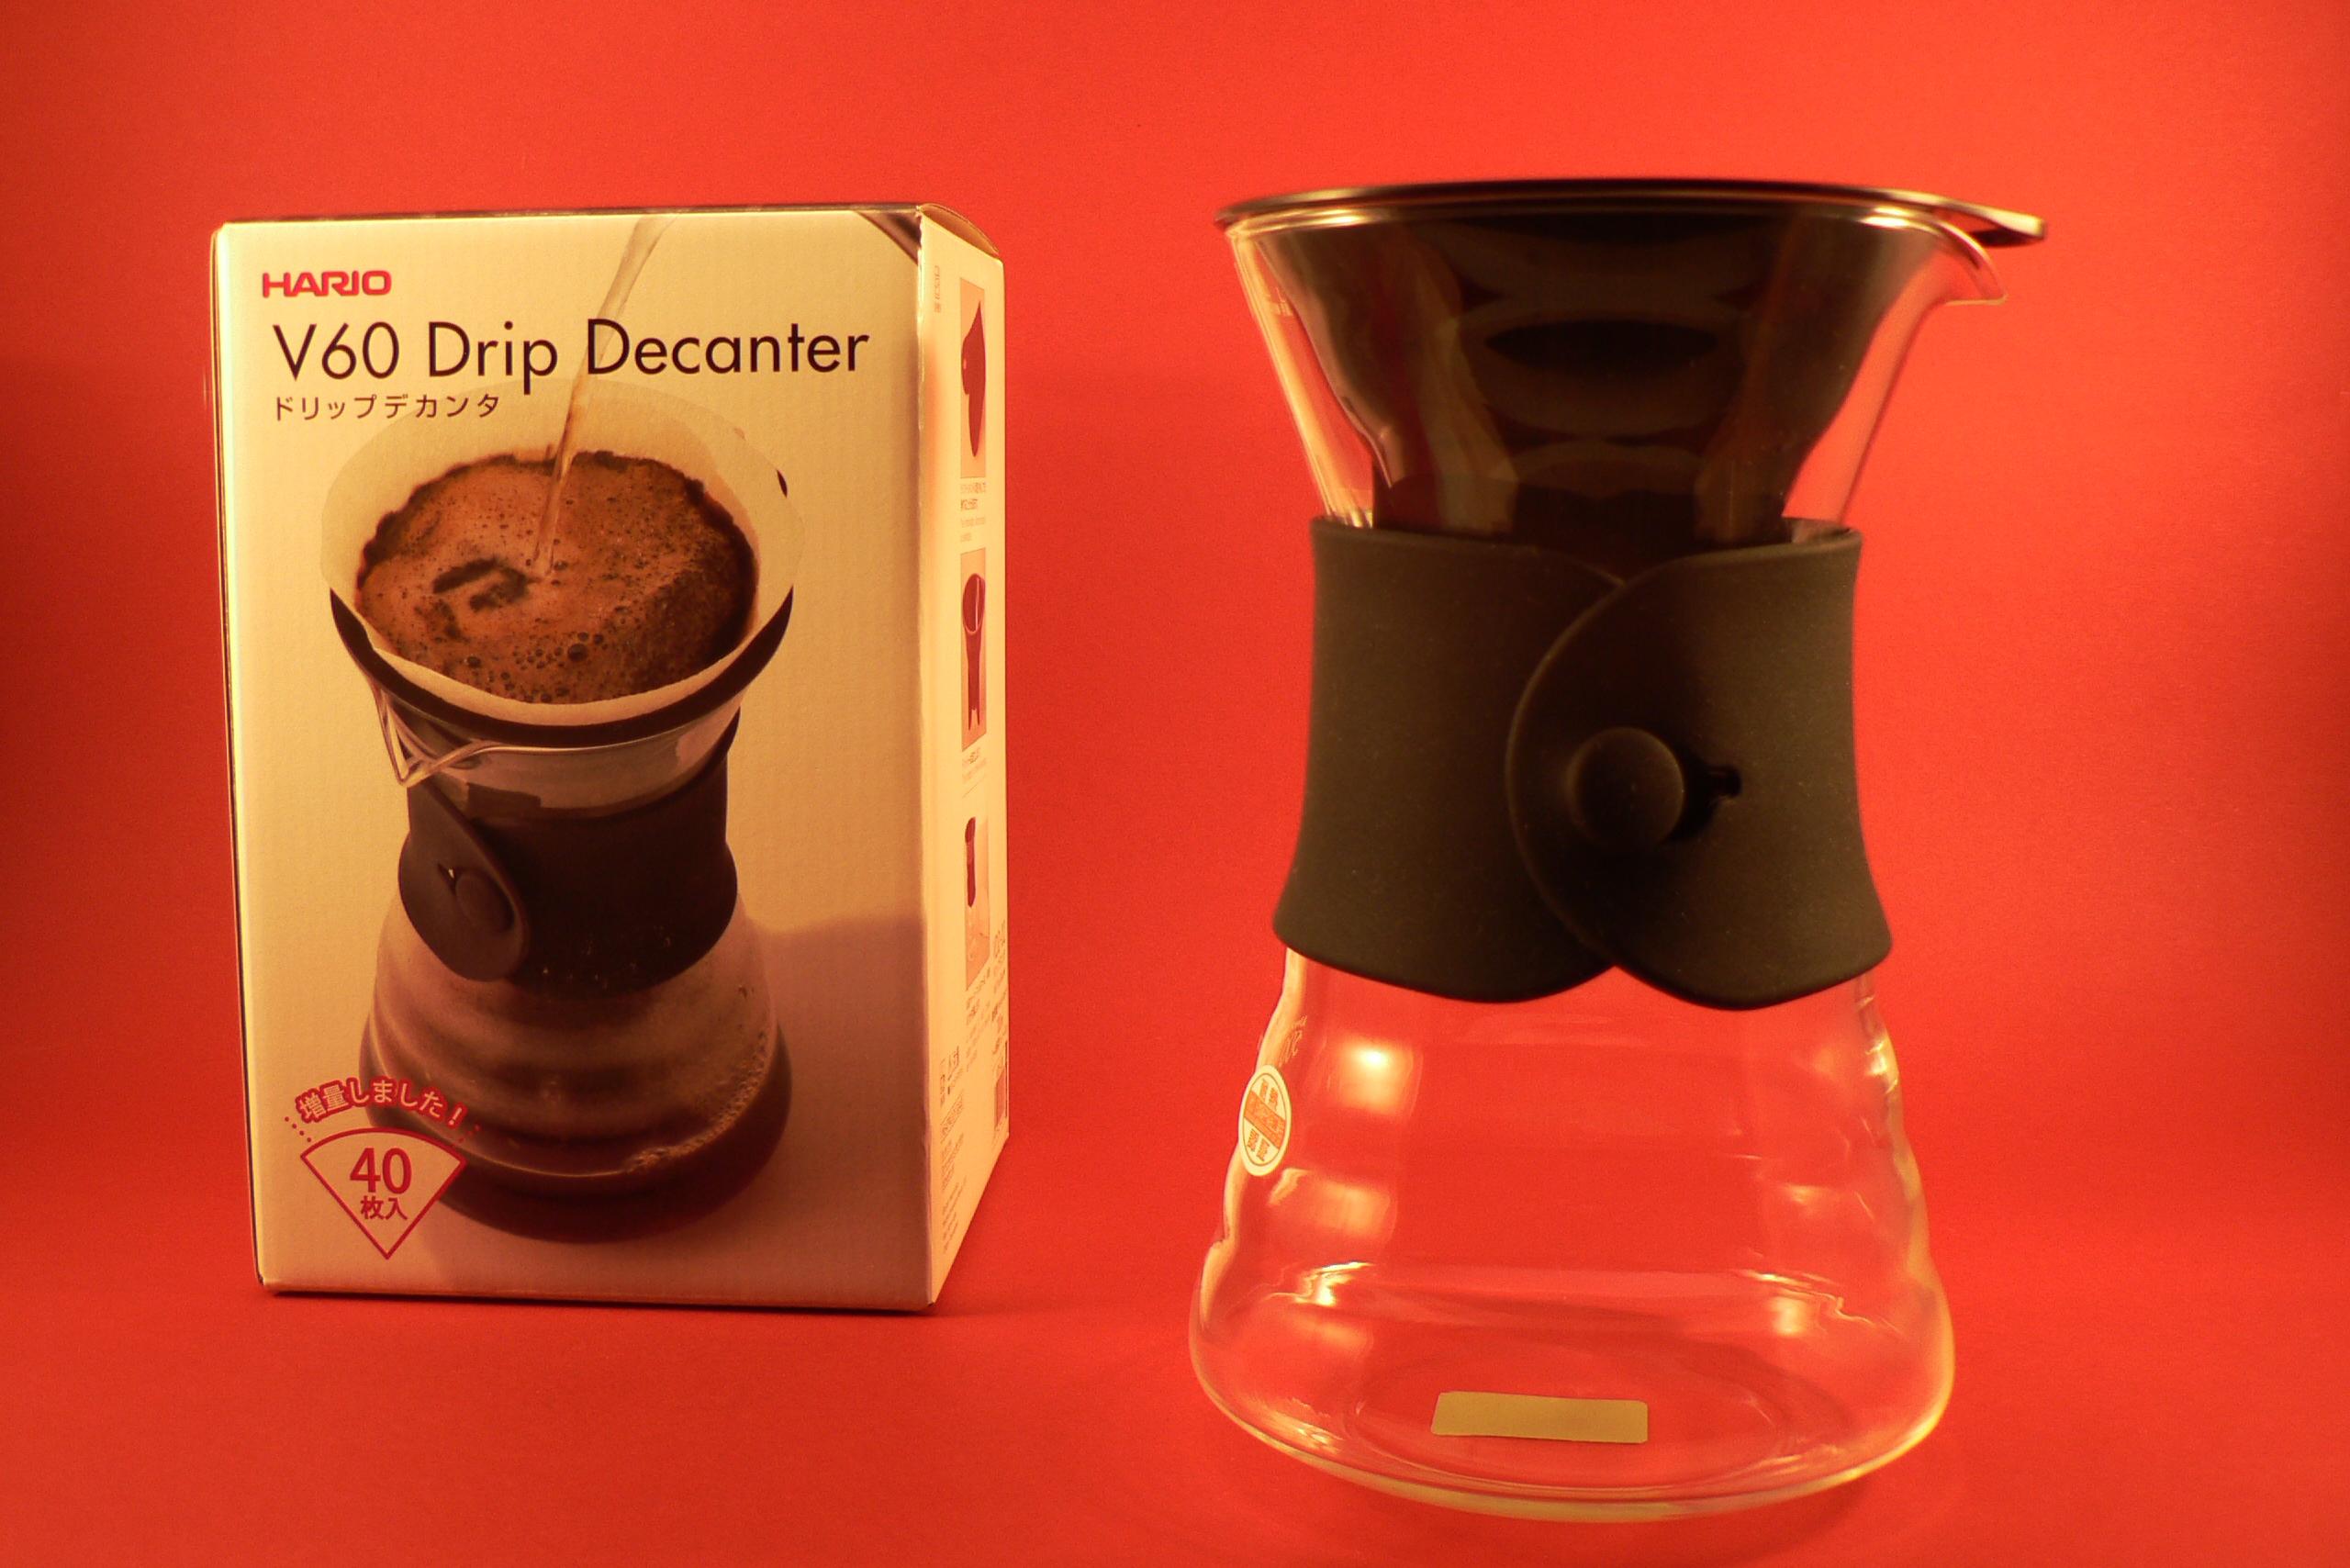 Hario V60 Drip Decanter (VDD-02B) Dekanter pro filtrovanou kávu